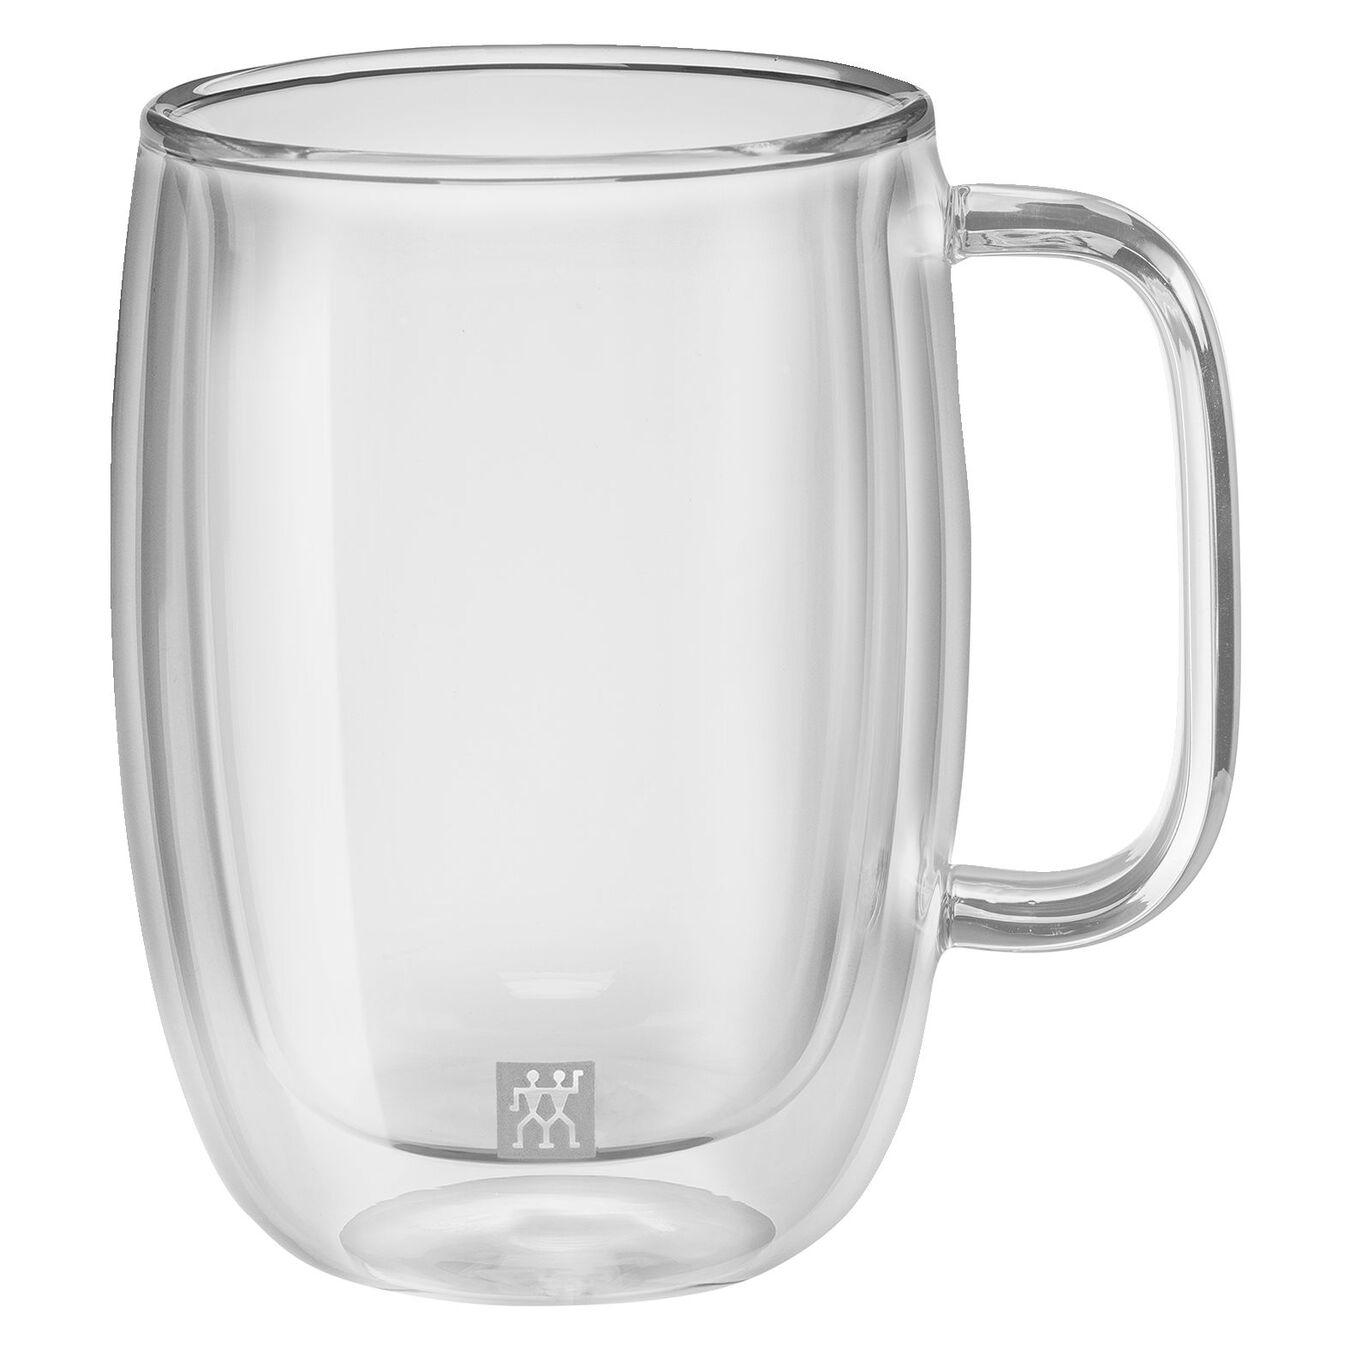 Latte Macchiato mugg set 450 ml / 2-st,,large 1